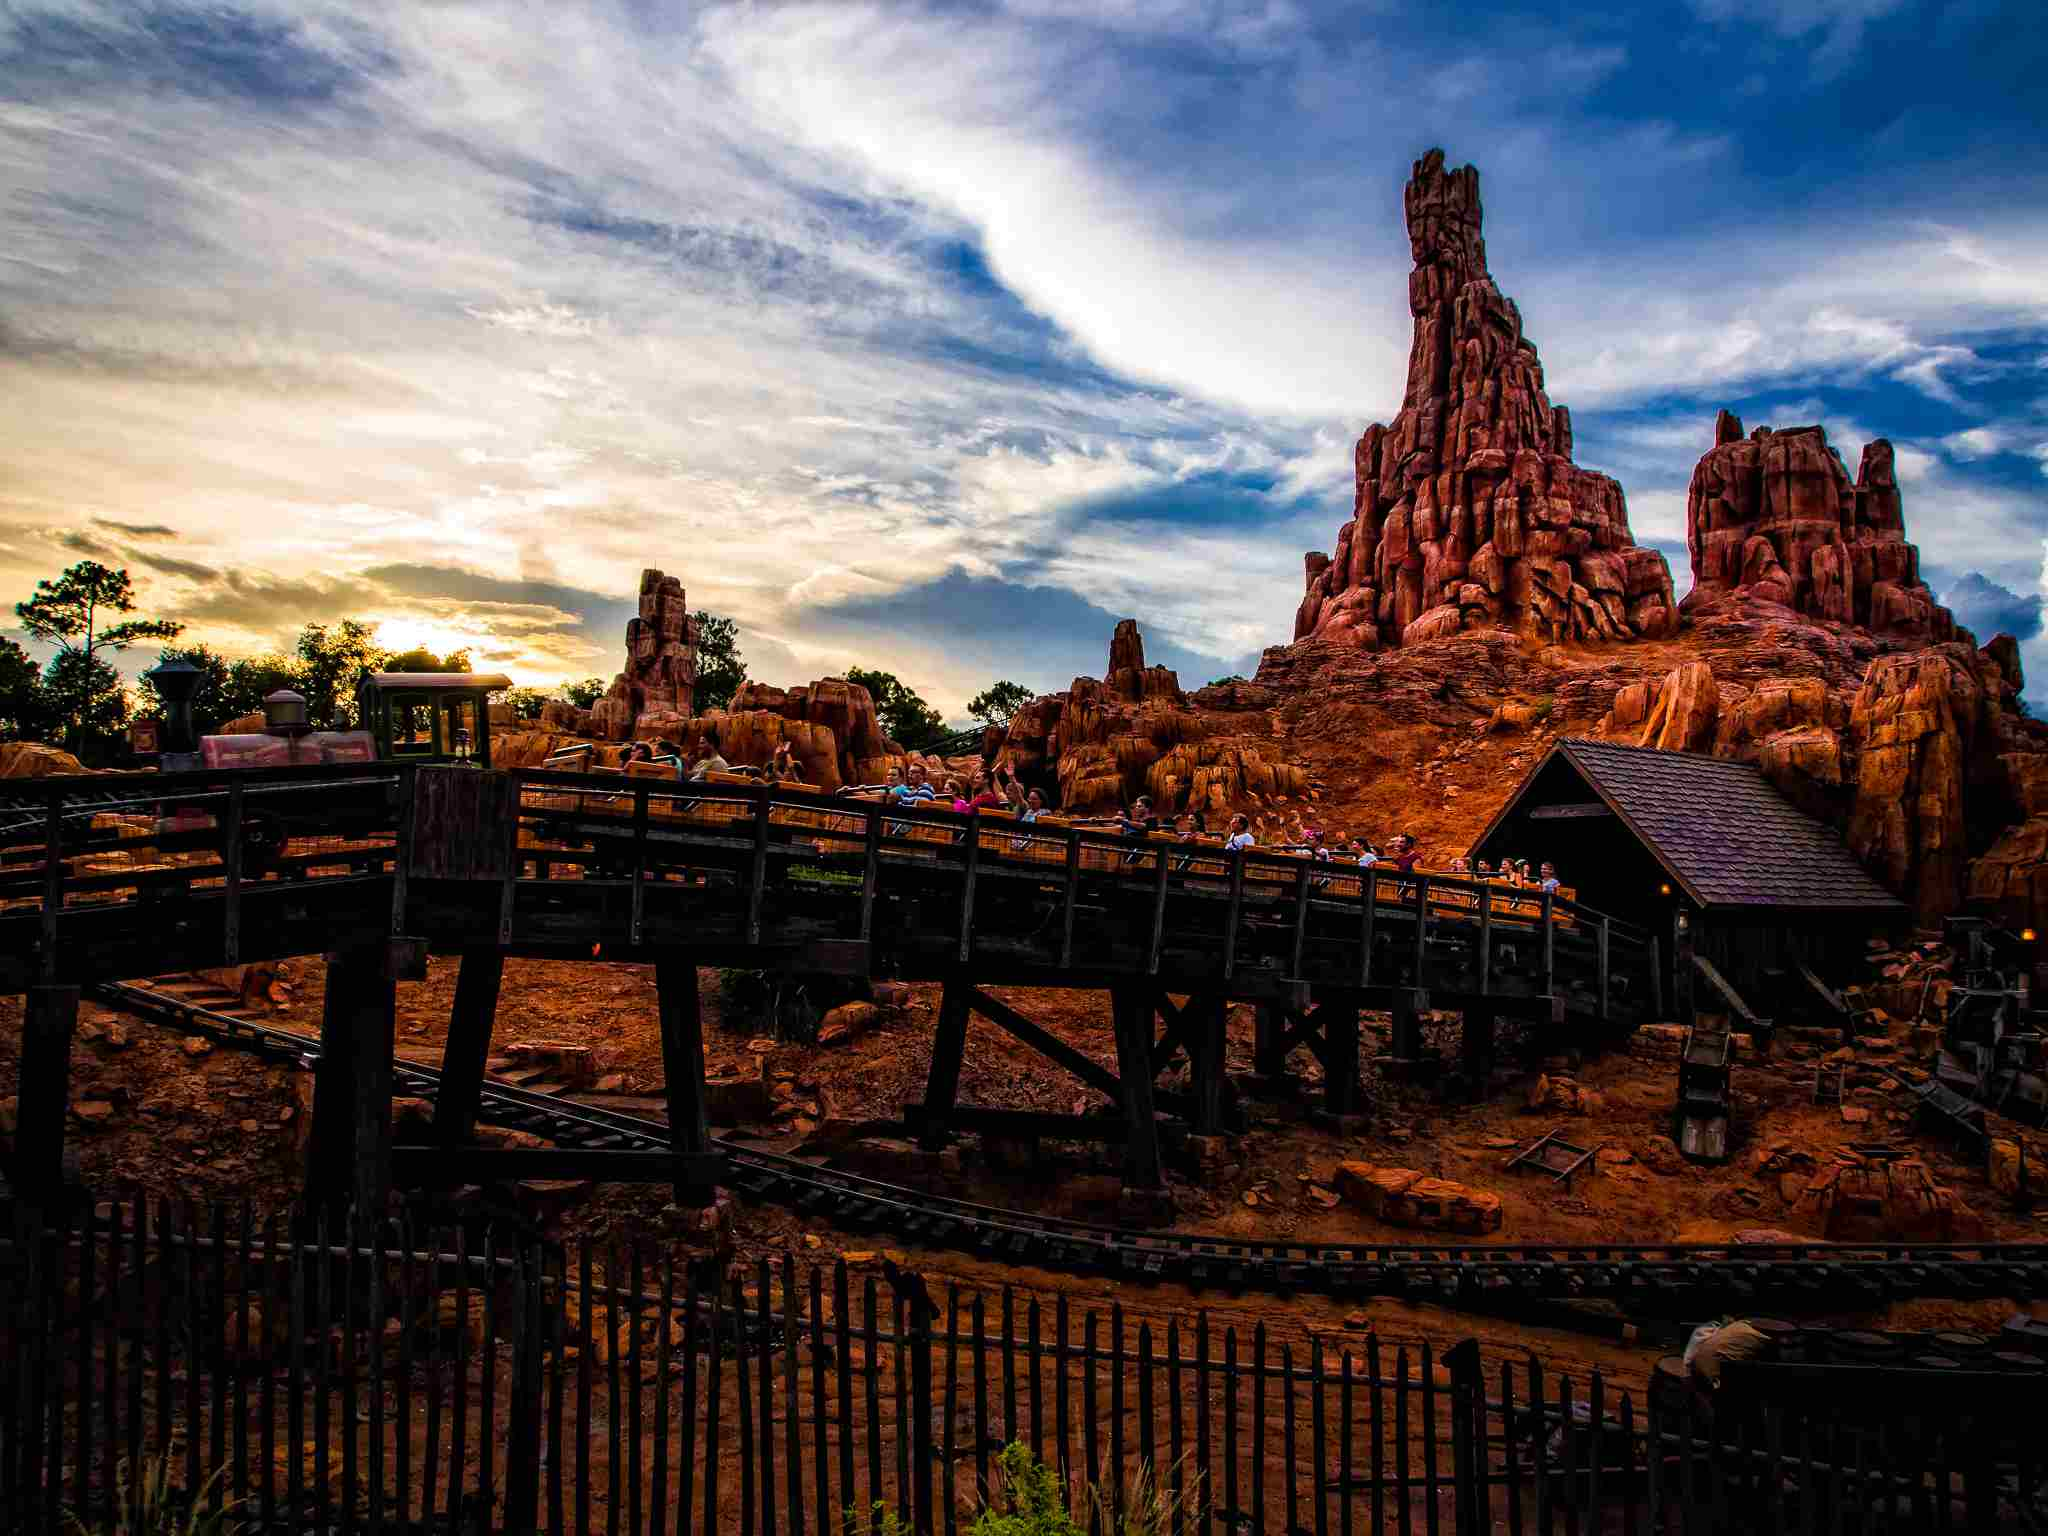 Thunder Mountain Disney World